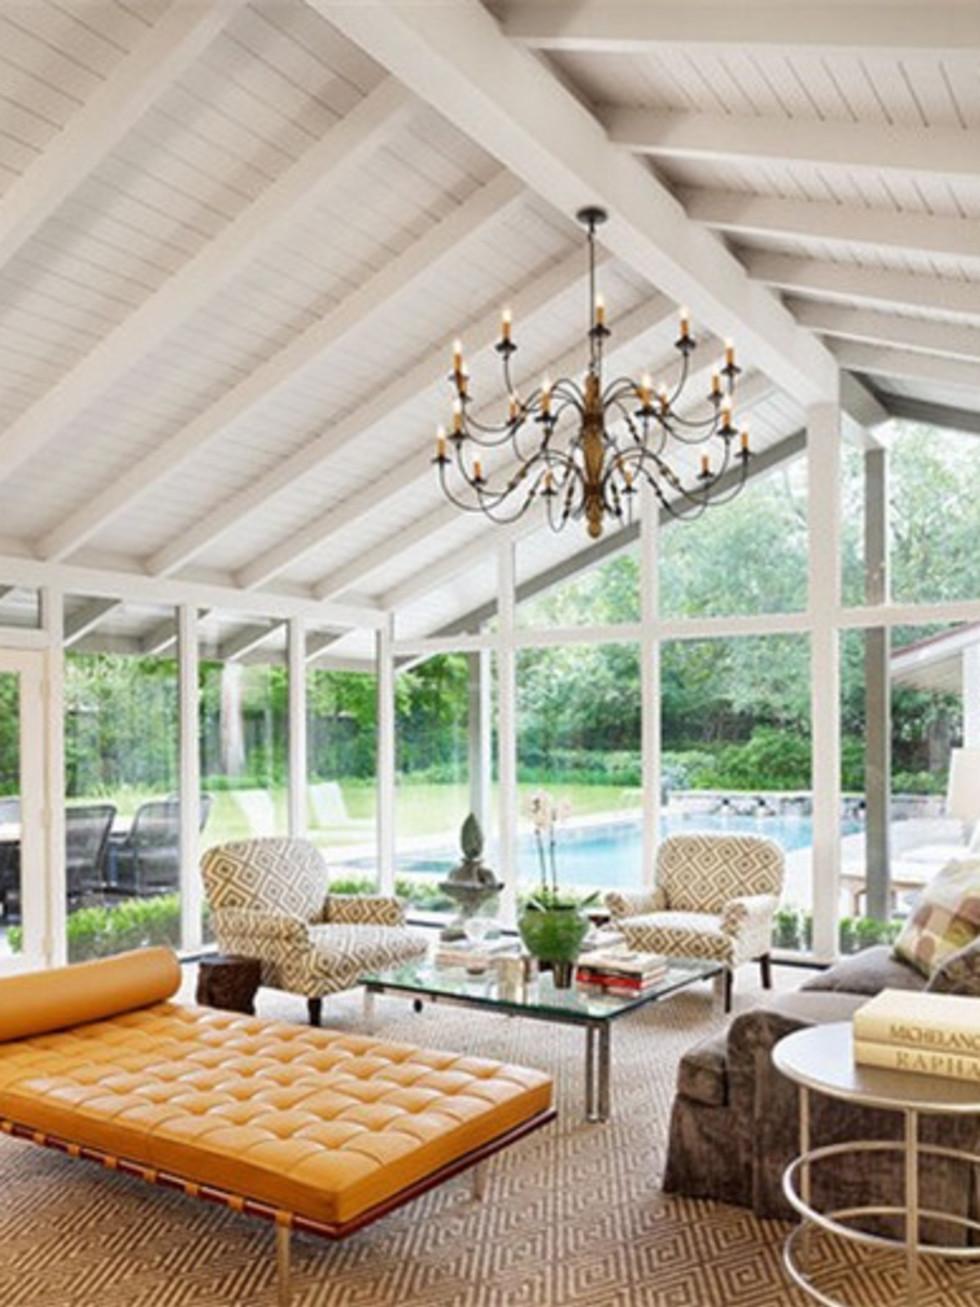 Porch.com Kyle Dillon Architecture living room